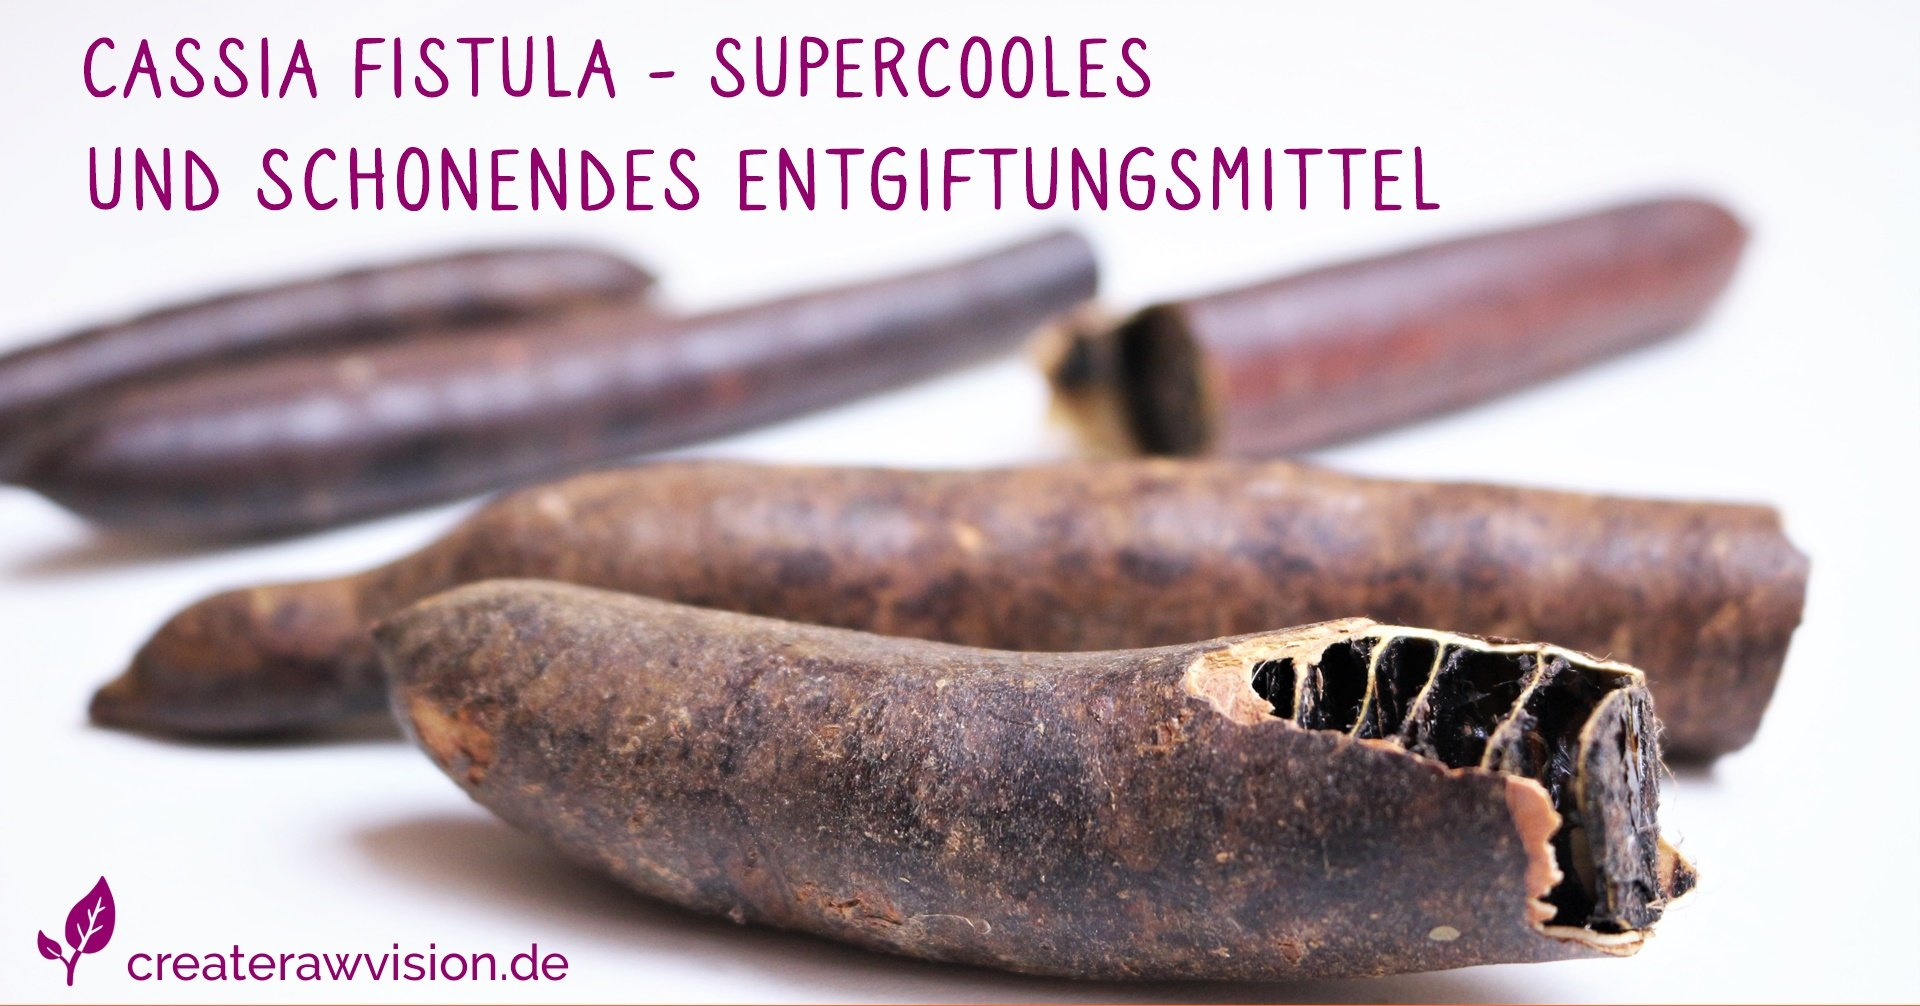 Cassia Fistula - Supercooles und Schonendes Entgiftungsmittel